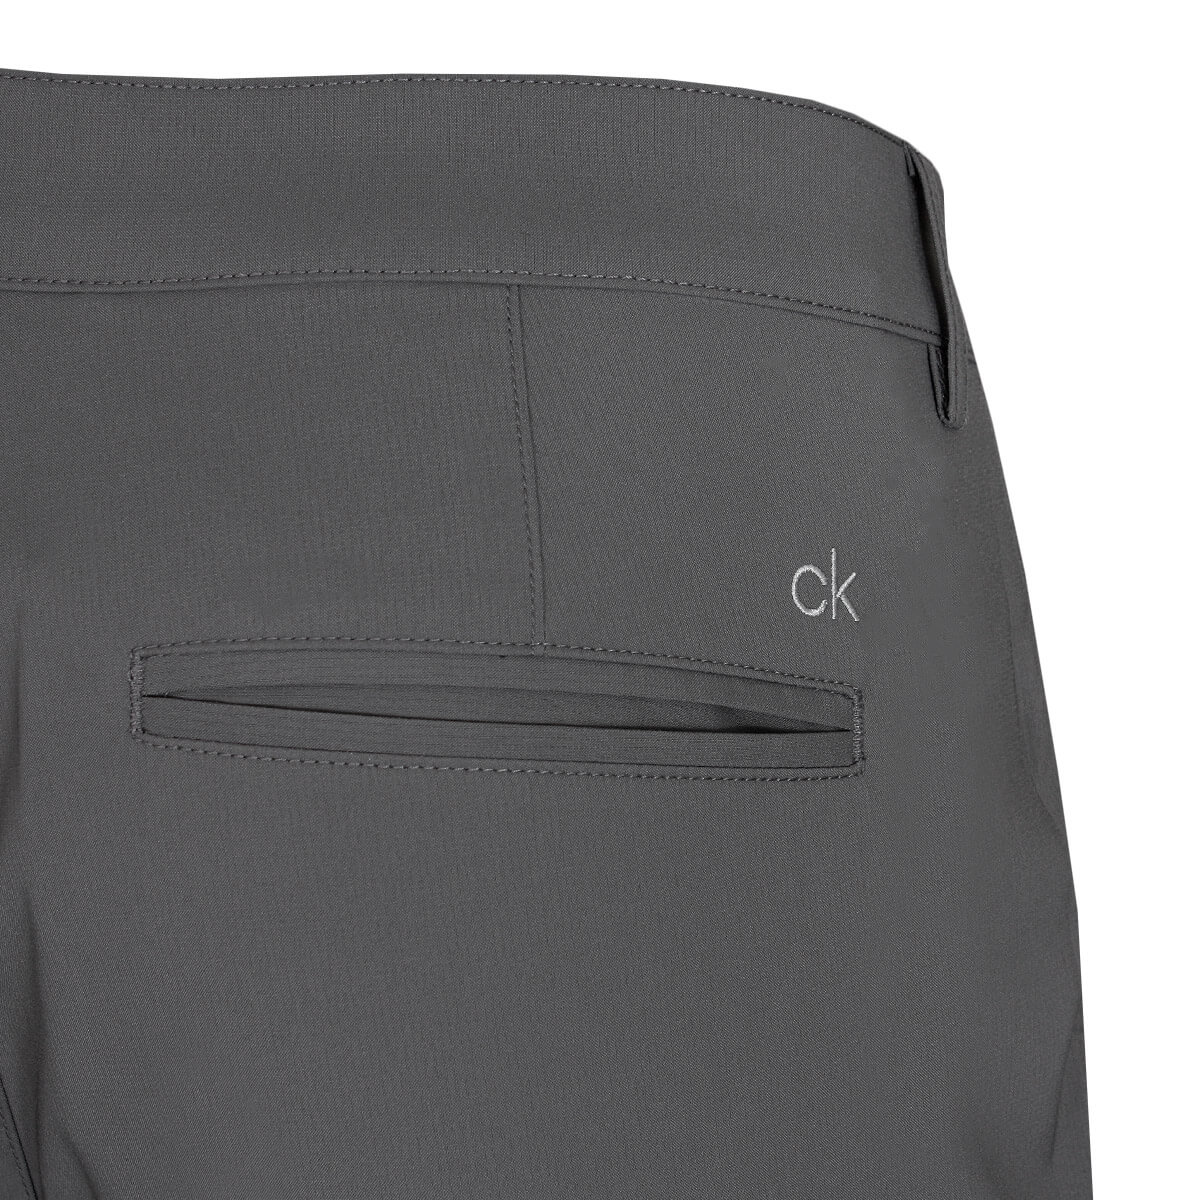 thumbnail 25 - Calvin Klein Mens 2021 Slim Fit Micro Tech Lightweight Golf Shorts 34% OFF RRP